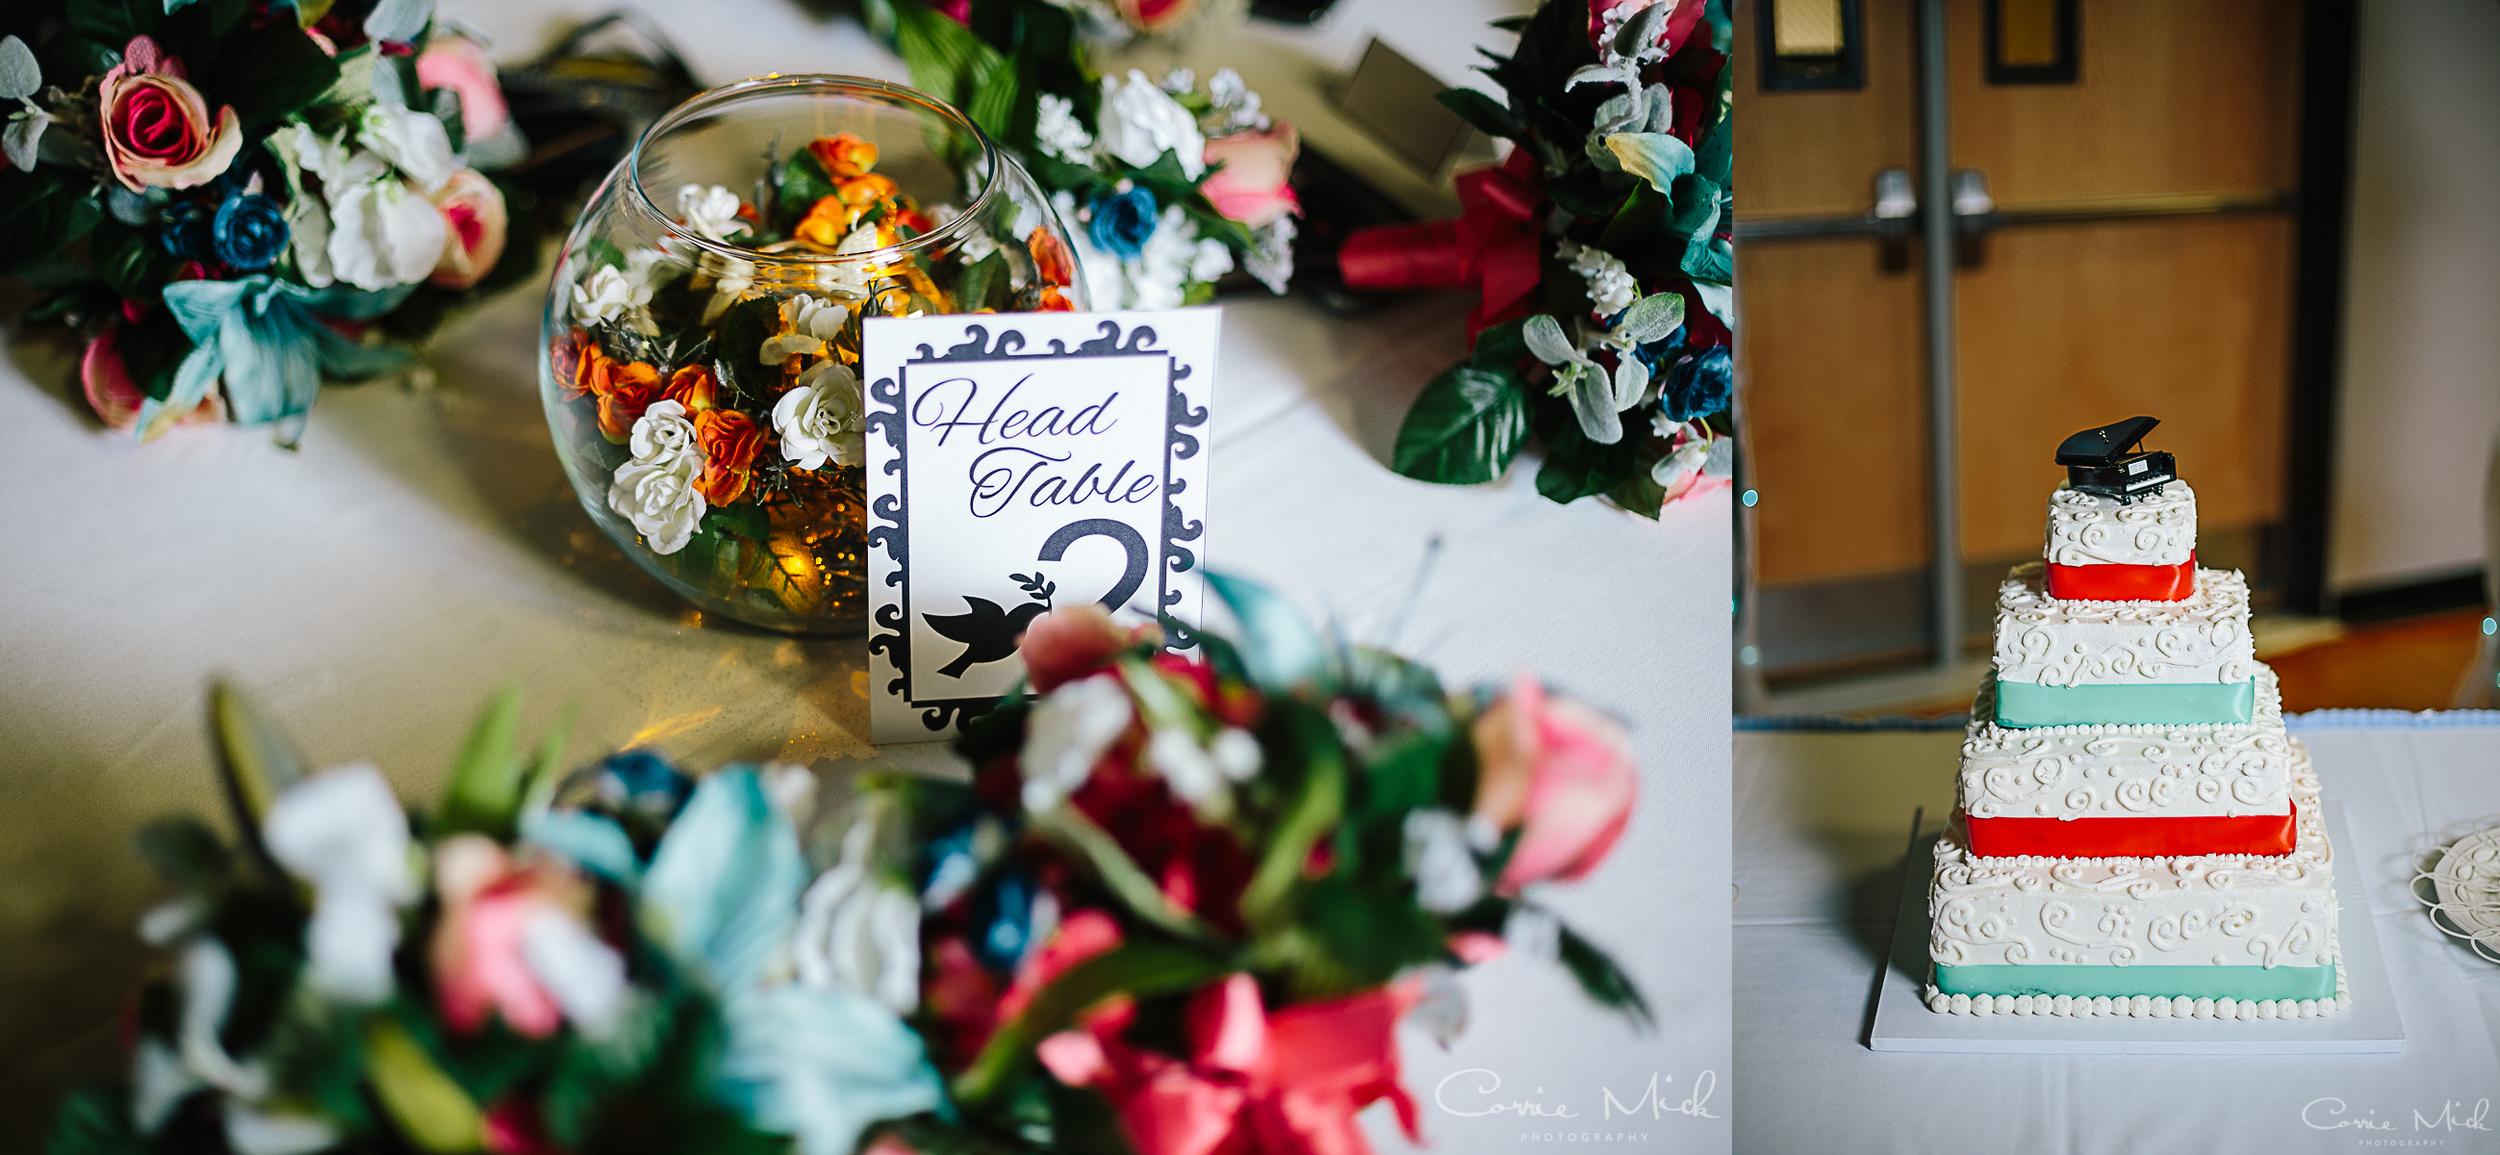 Cake & Head Table - Corrie Mick Photography.jpg